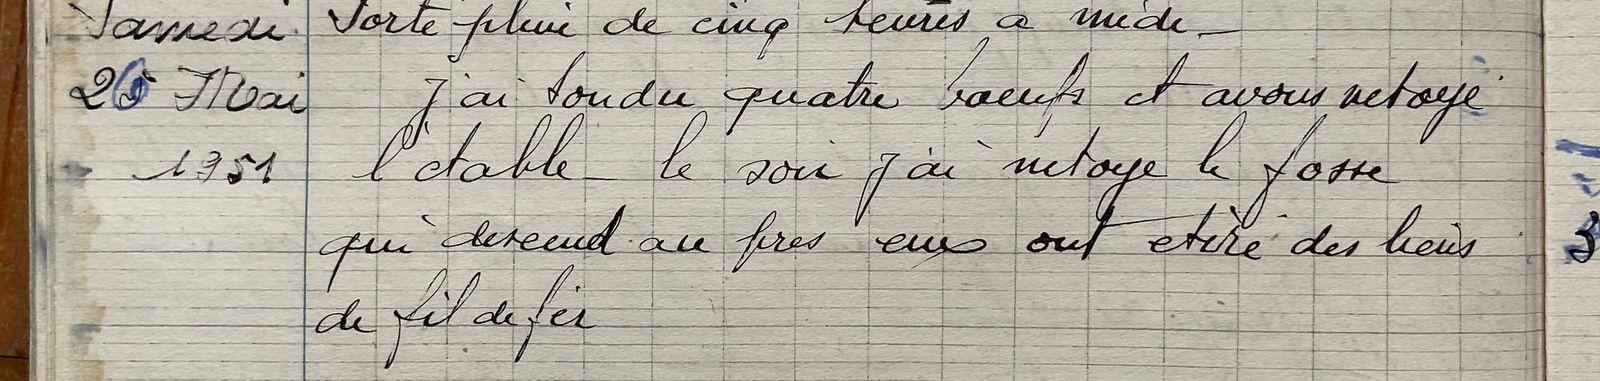 Samedi 26 mai 1951 - quatre boeufs tondus